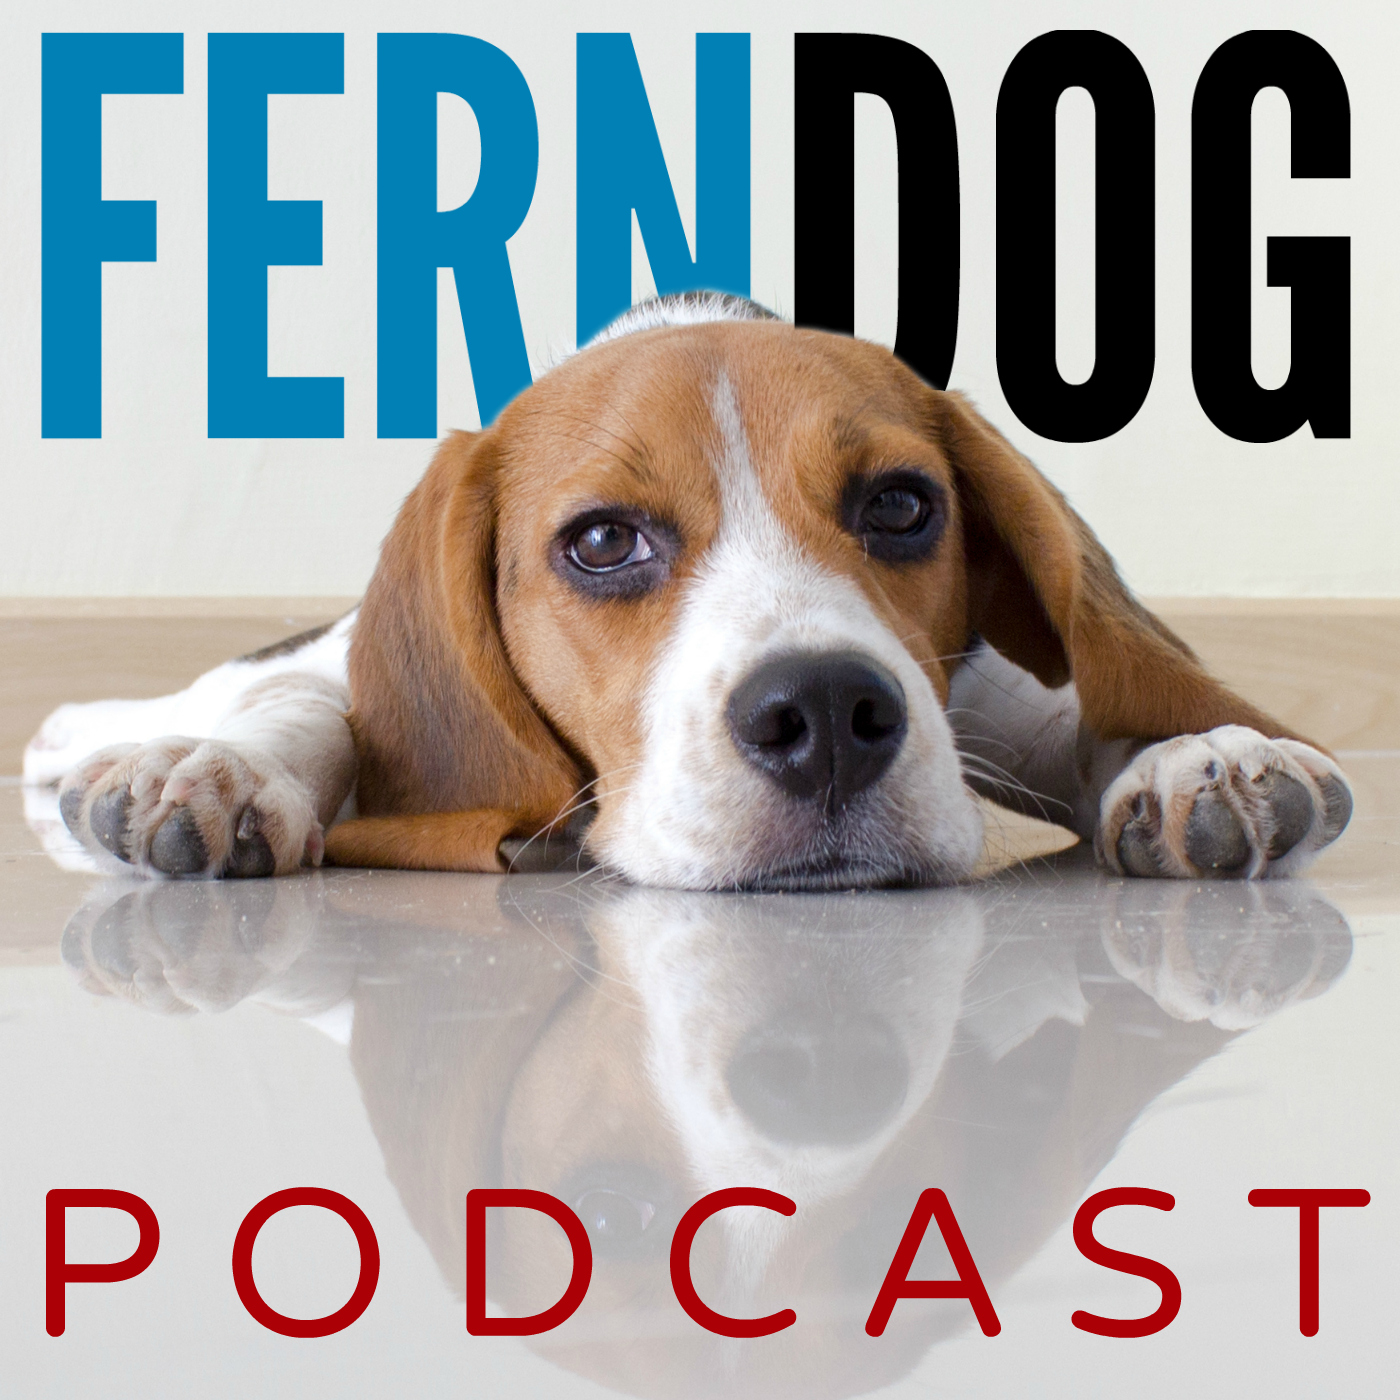 FernDog Podcast: Dog Training & Behavior Tips and Advice show art